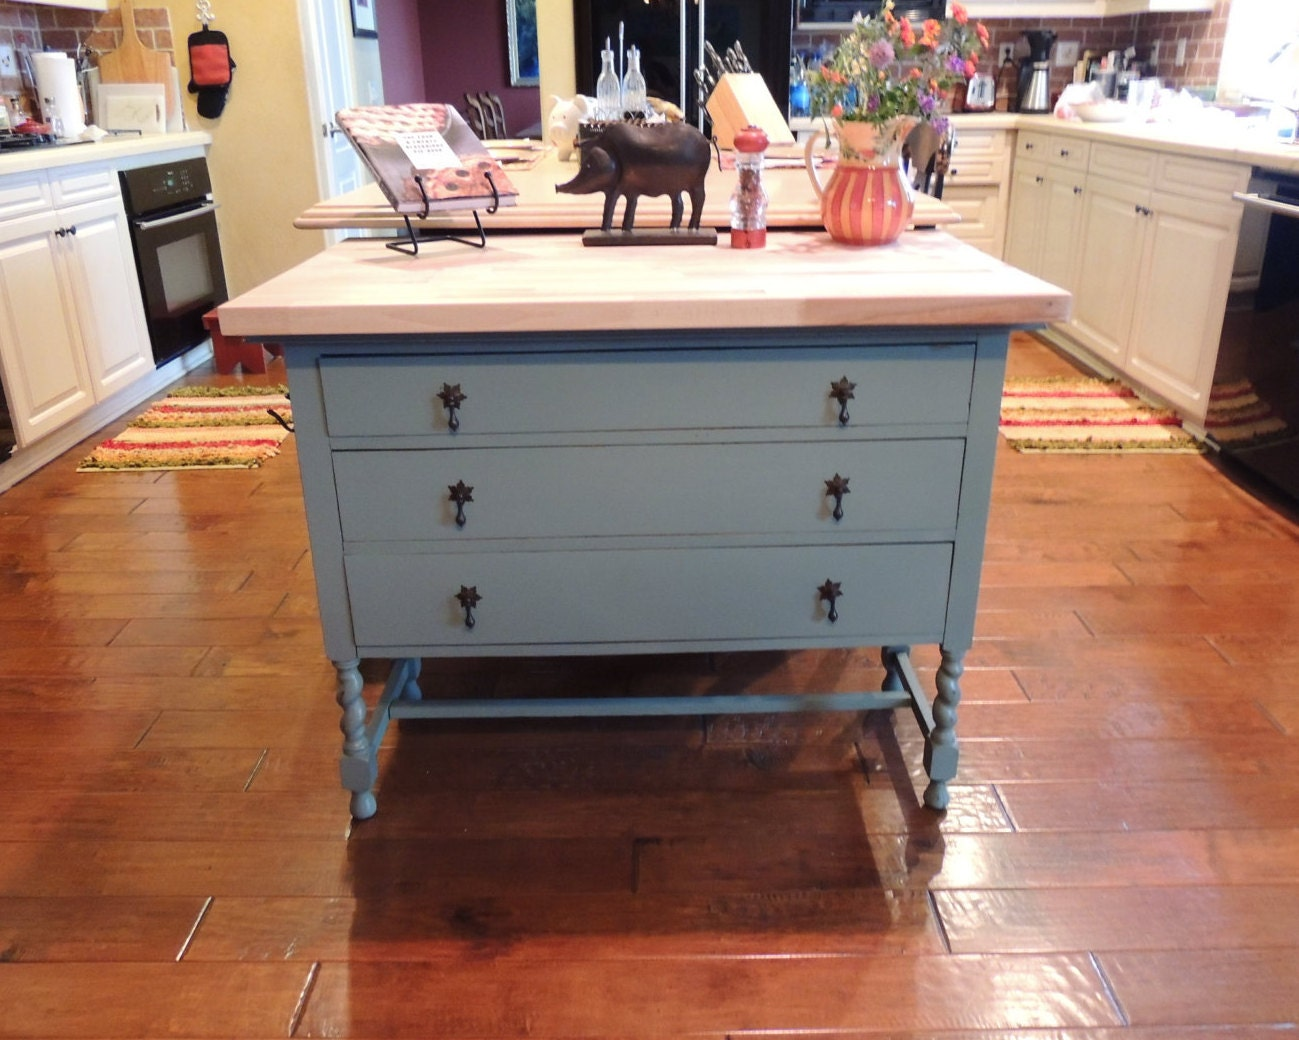 Repurposed Antique Dresser As A Kitchen Island With A: 1920s Vintage Repurposed Kitchen Island By OurVintageKitchenCo